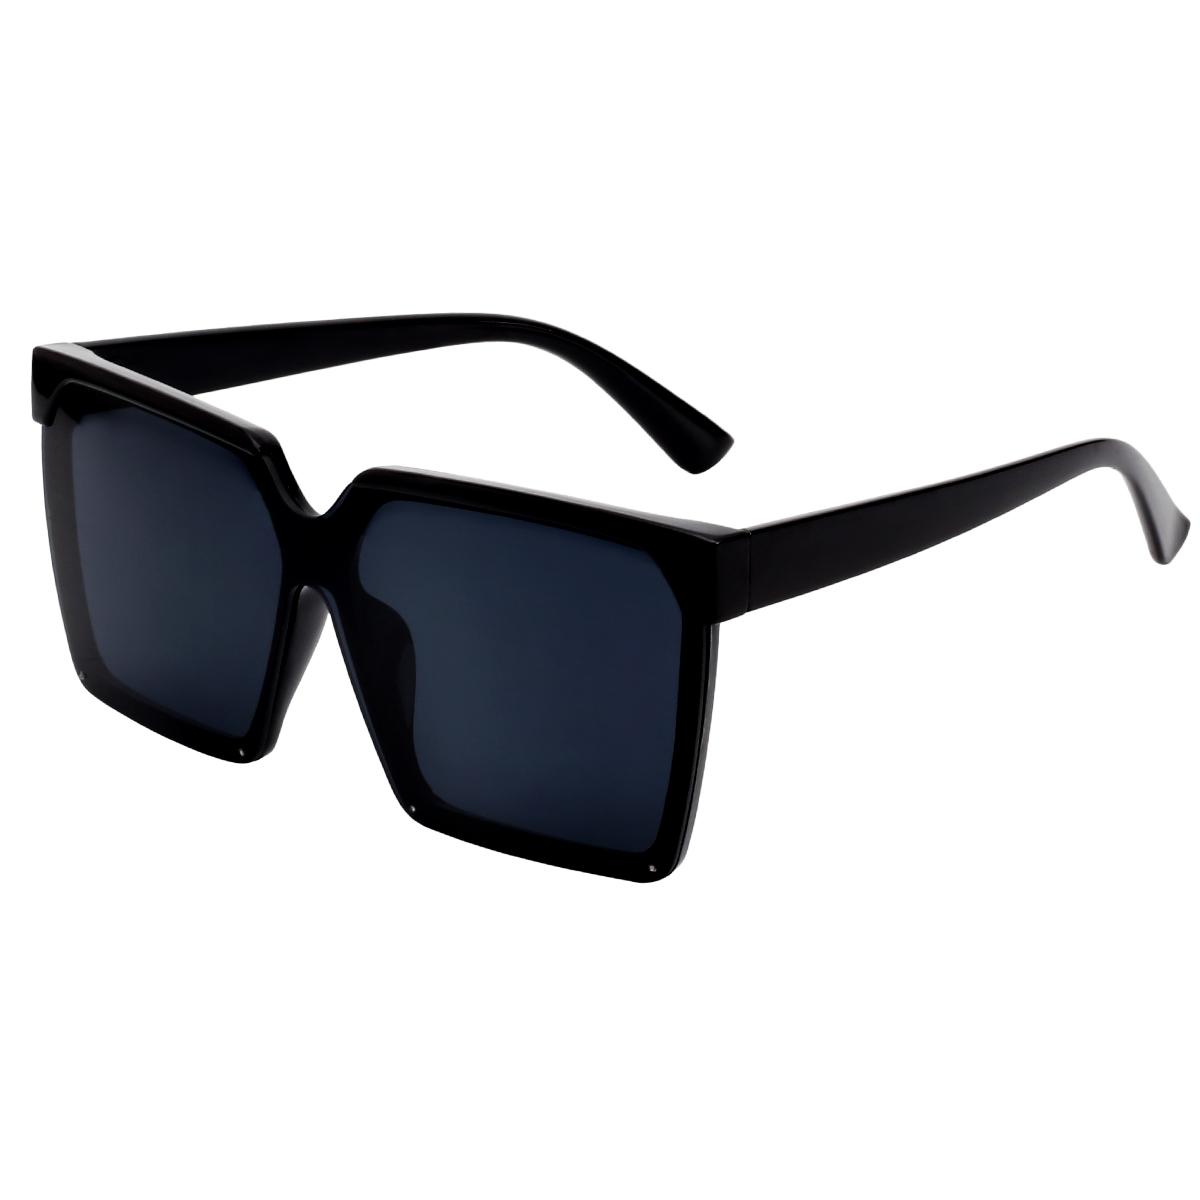 Zonnebril Like a Boss zwart zwarte stoere chique dames zonnebrillen trends fashion yehwang kopen bestellen